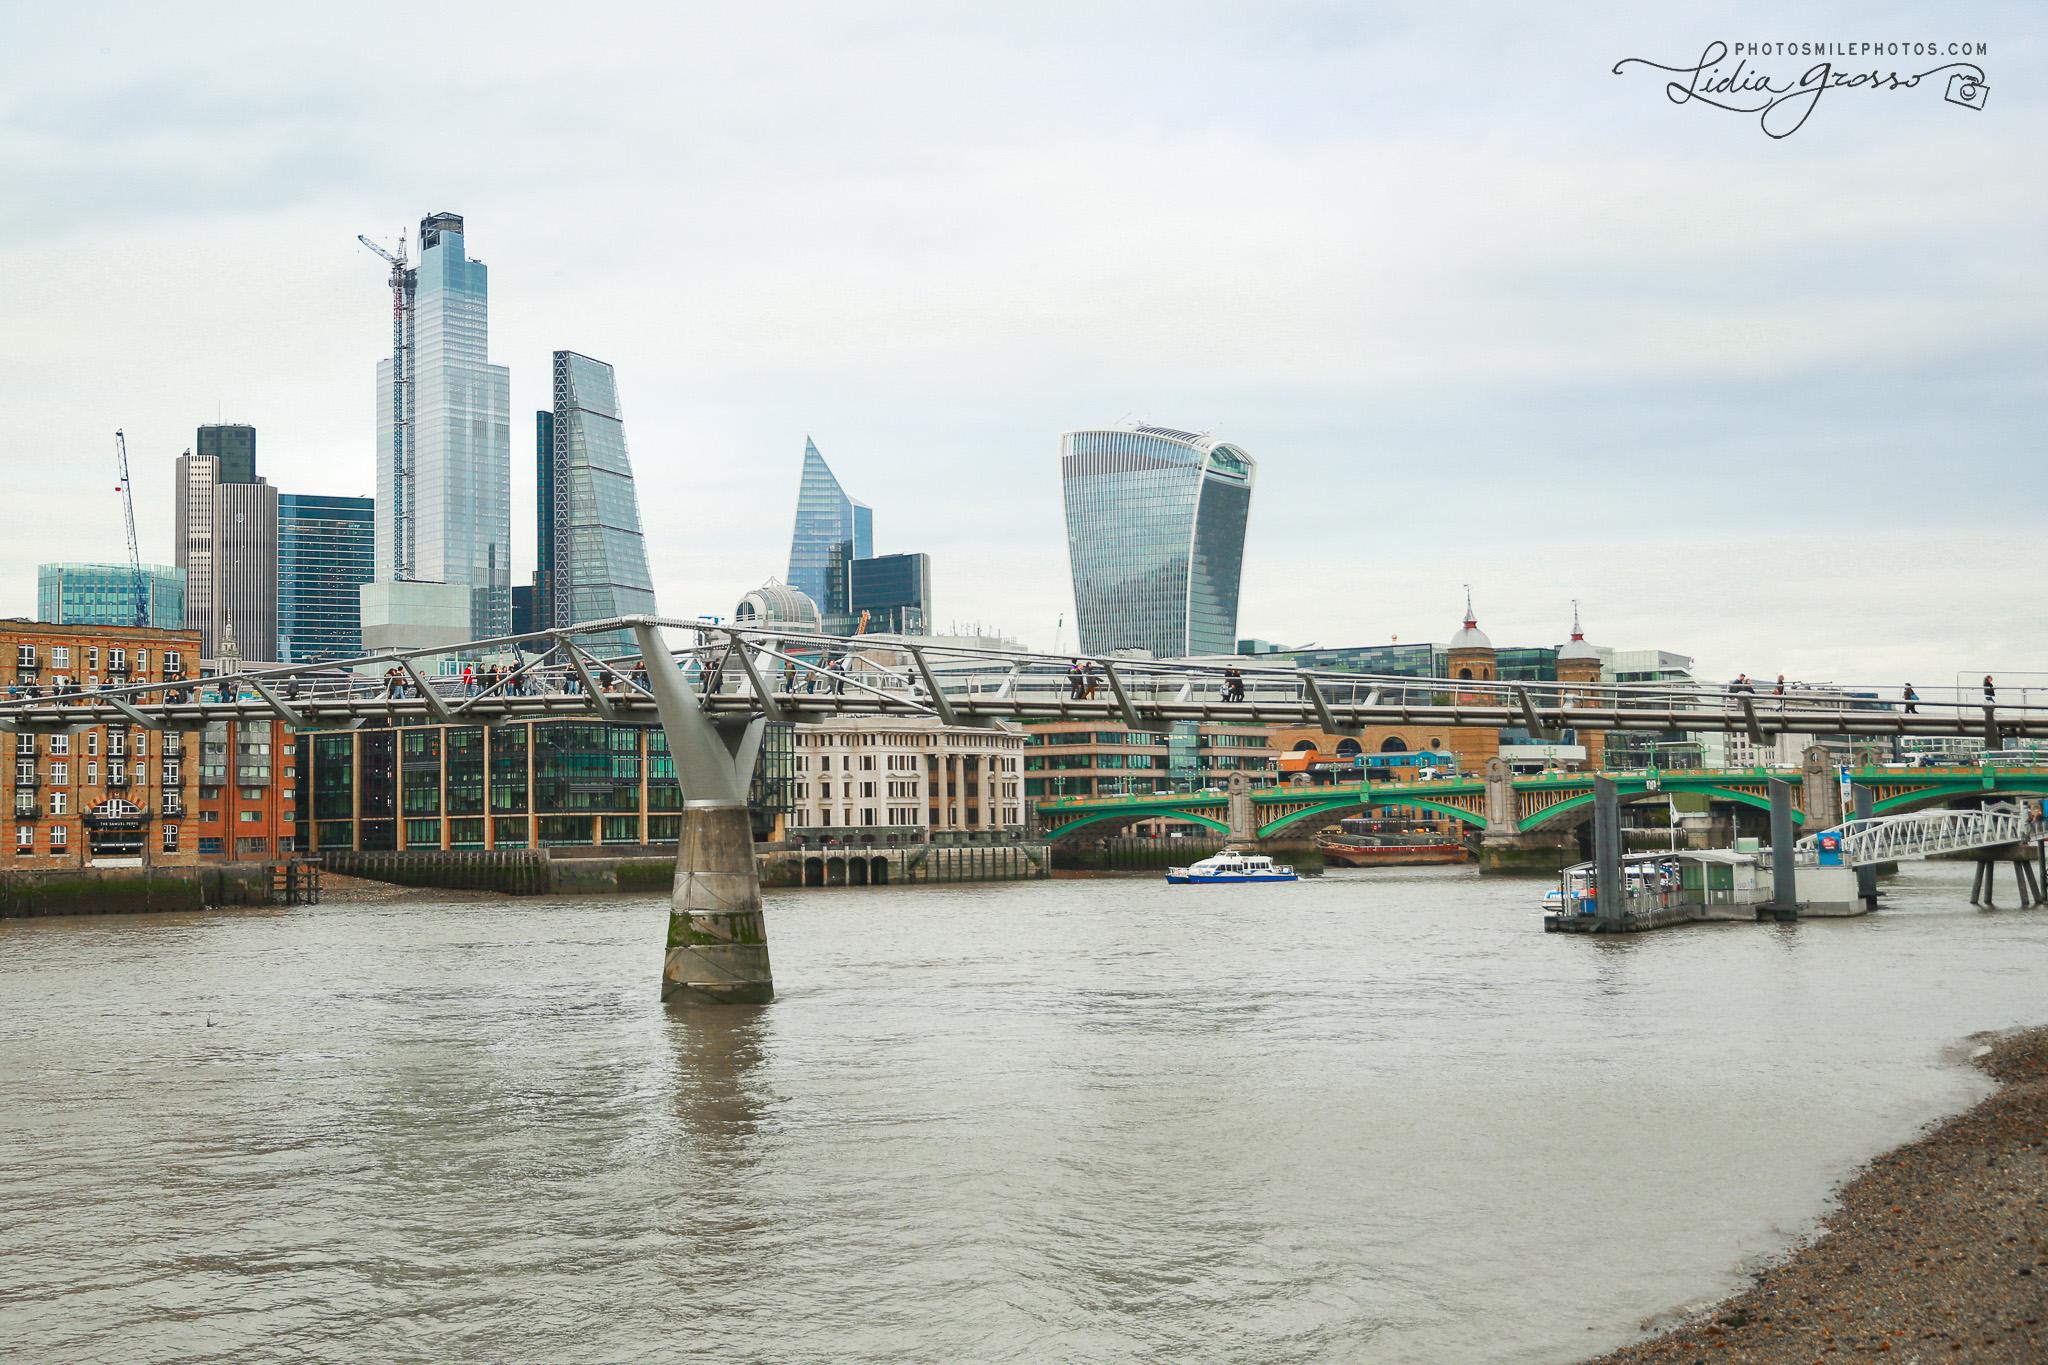 London, England, 2019 Travel Photos